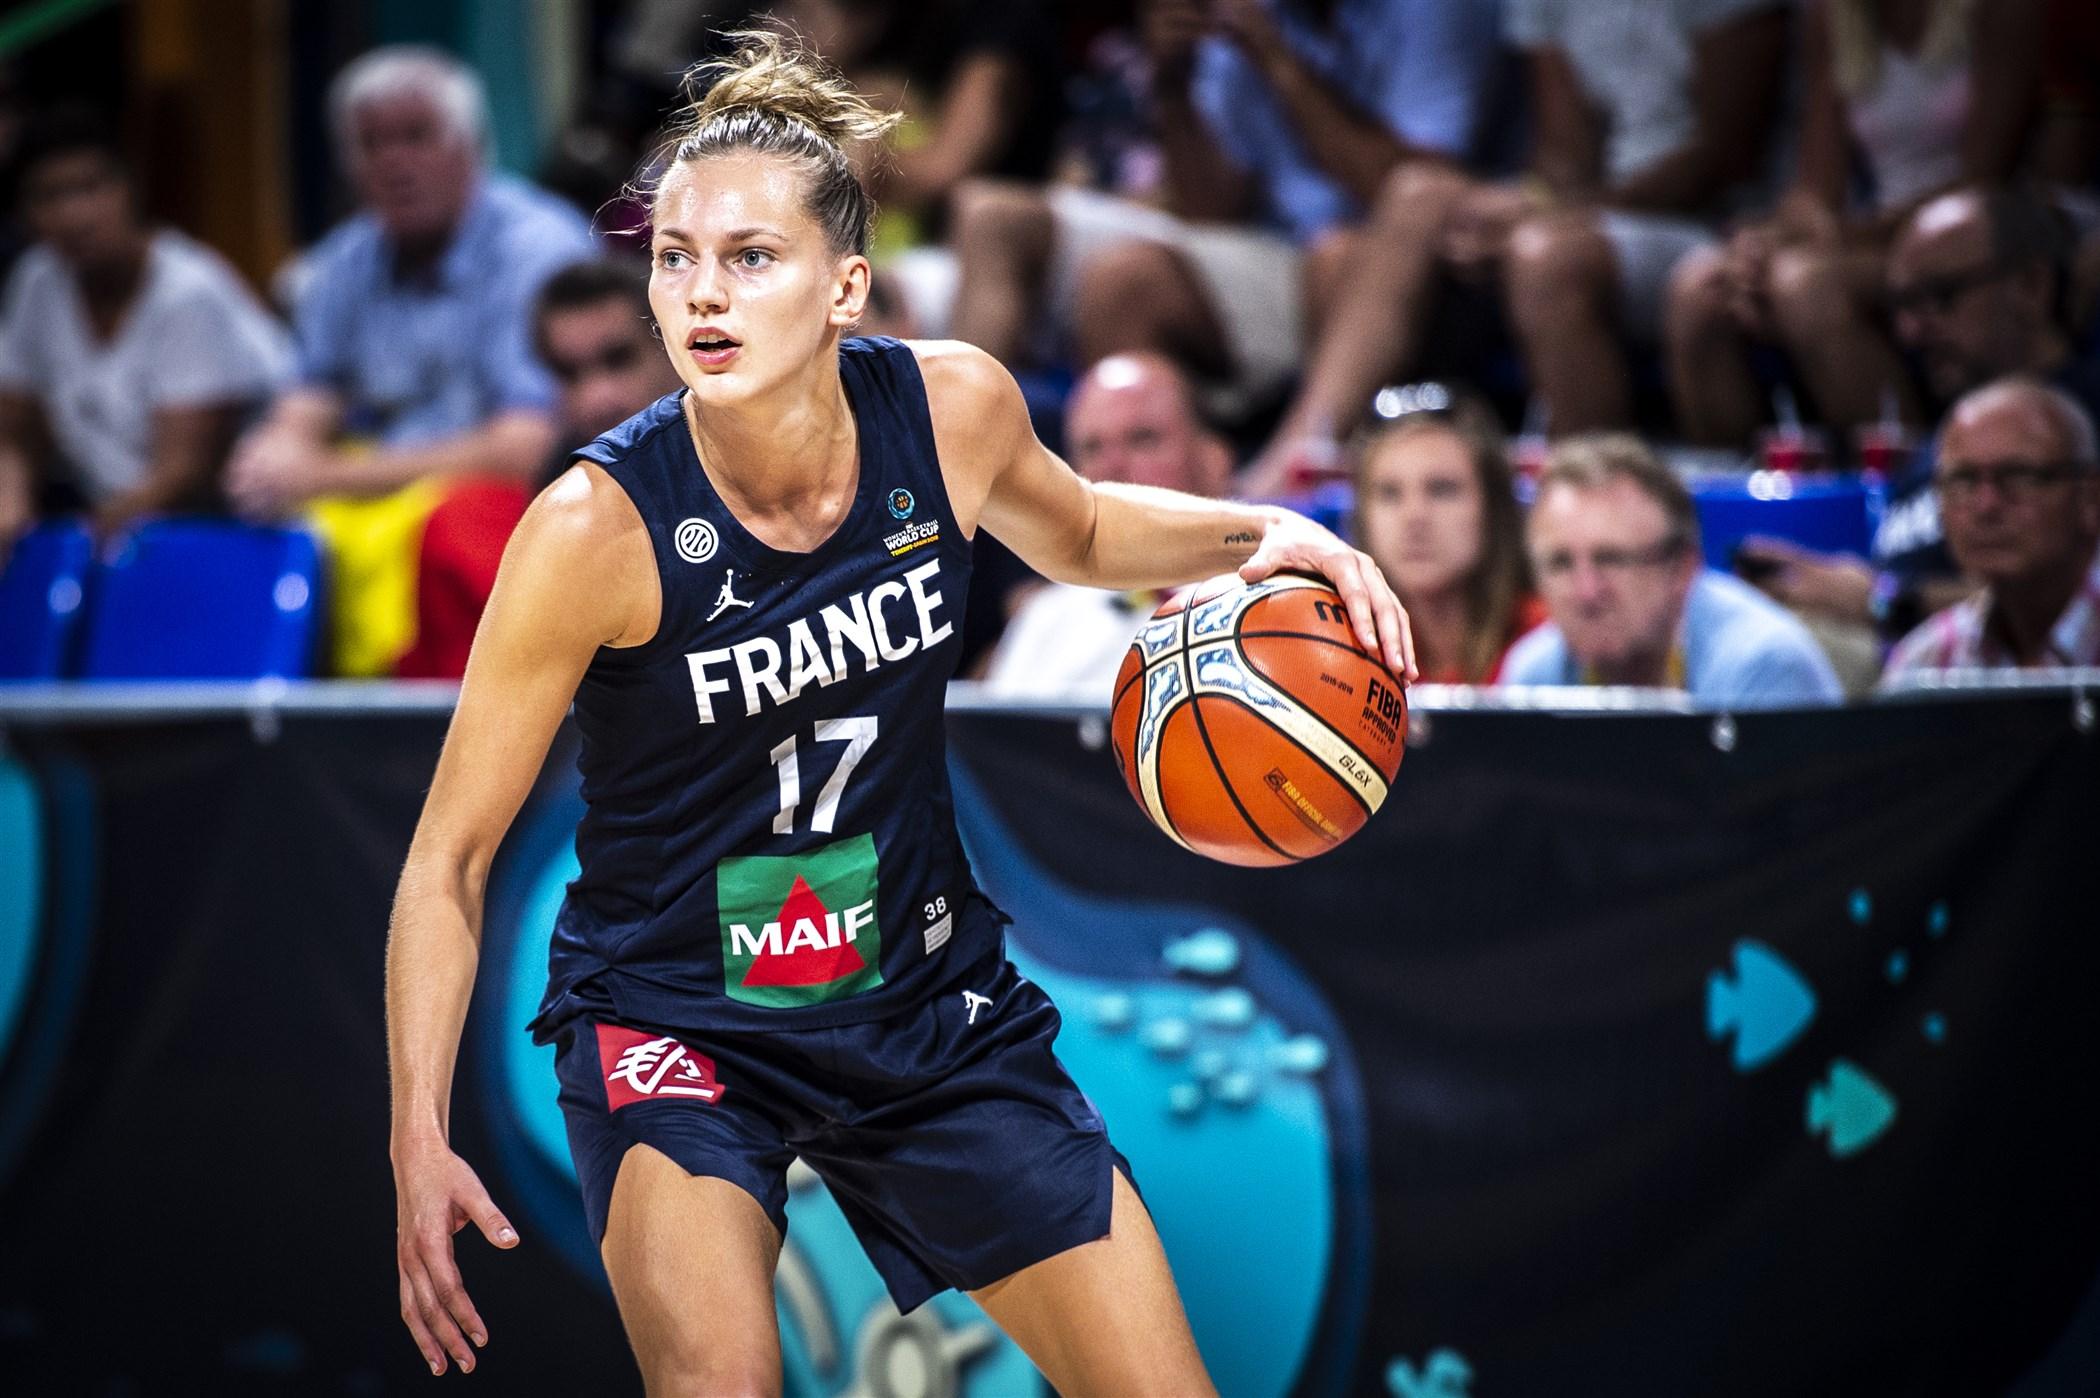 Calendario Eurobasket.Calendario Eurobasket 2020 Calendario 2020